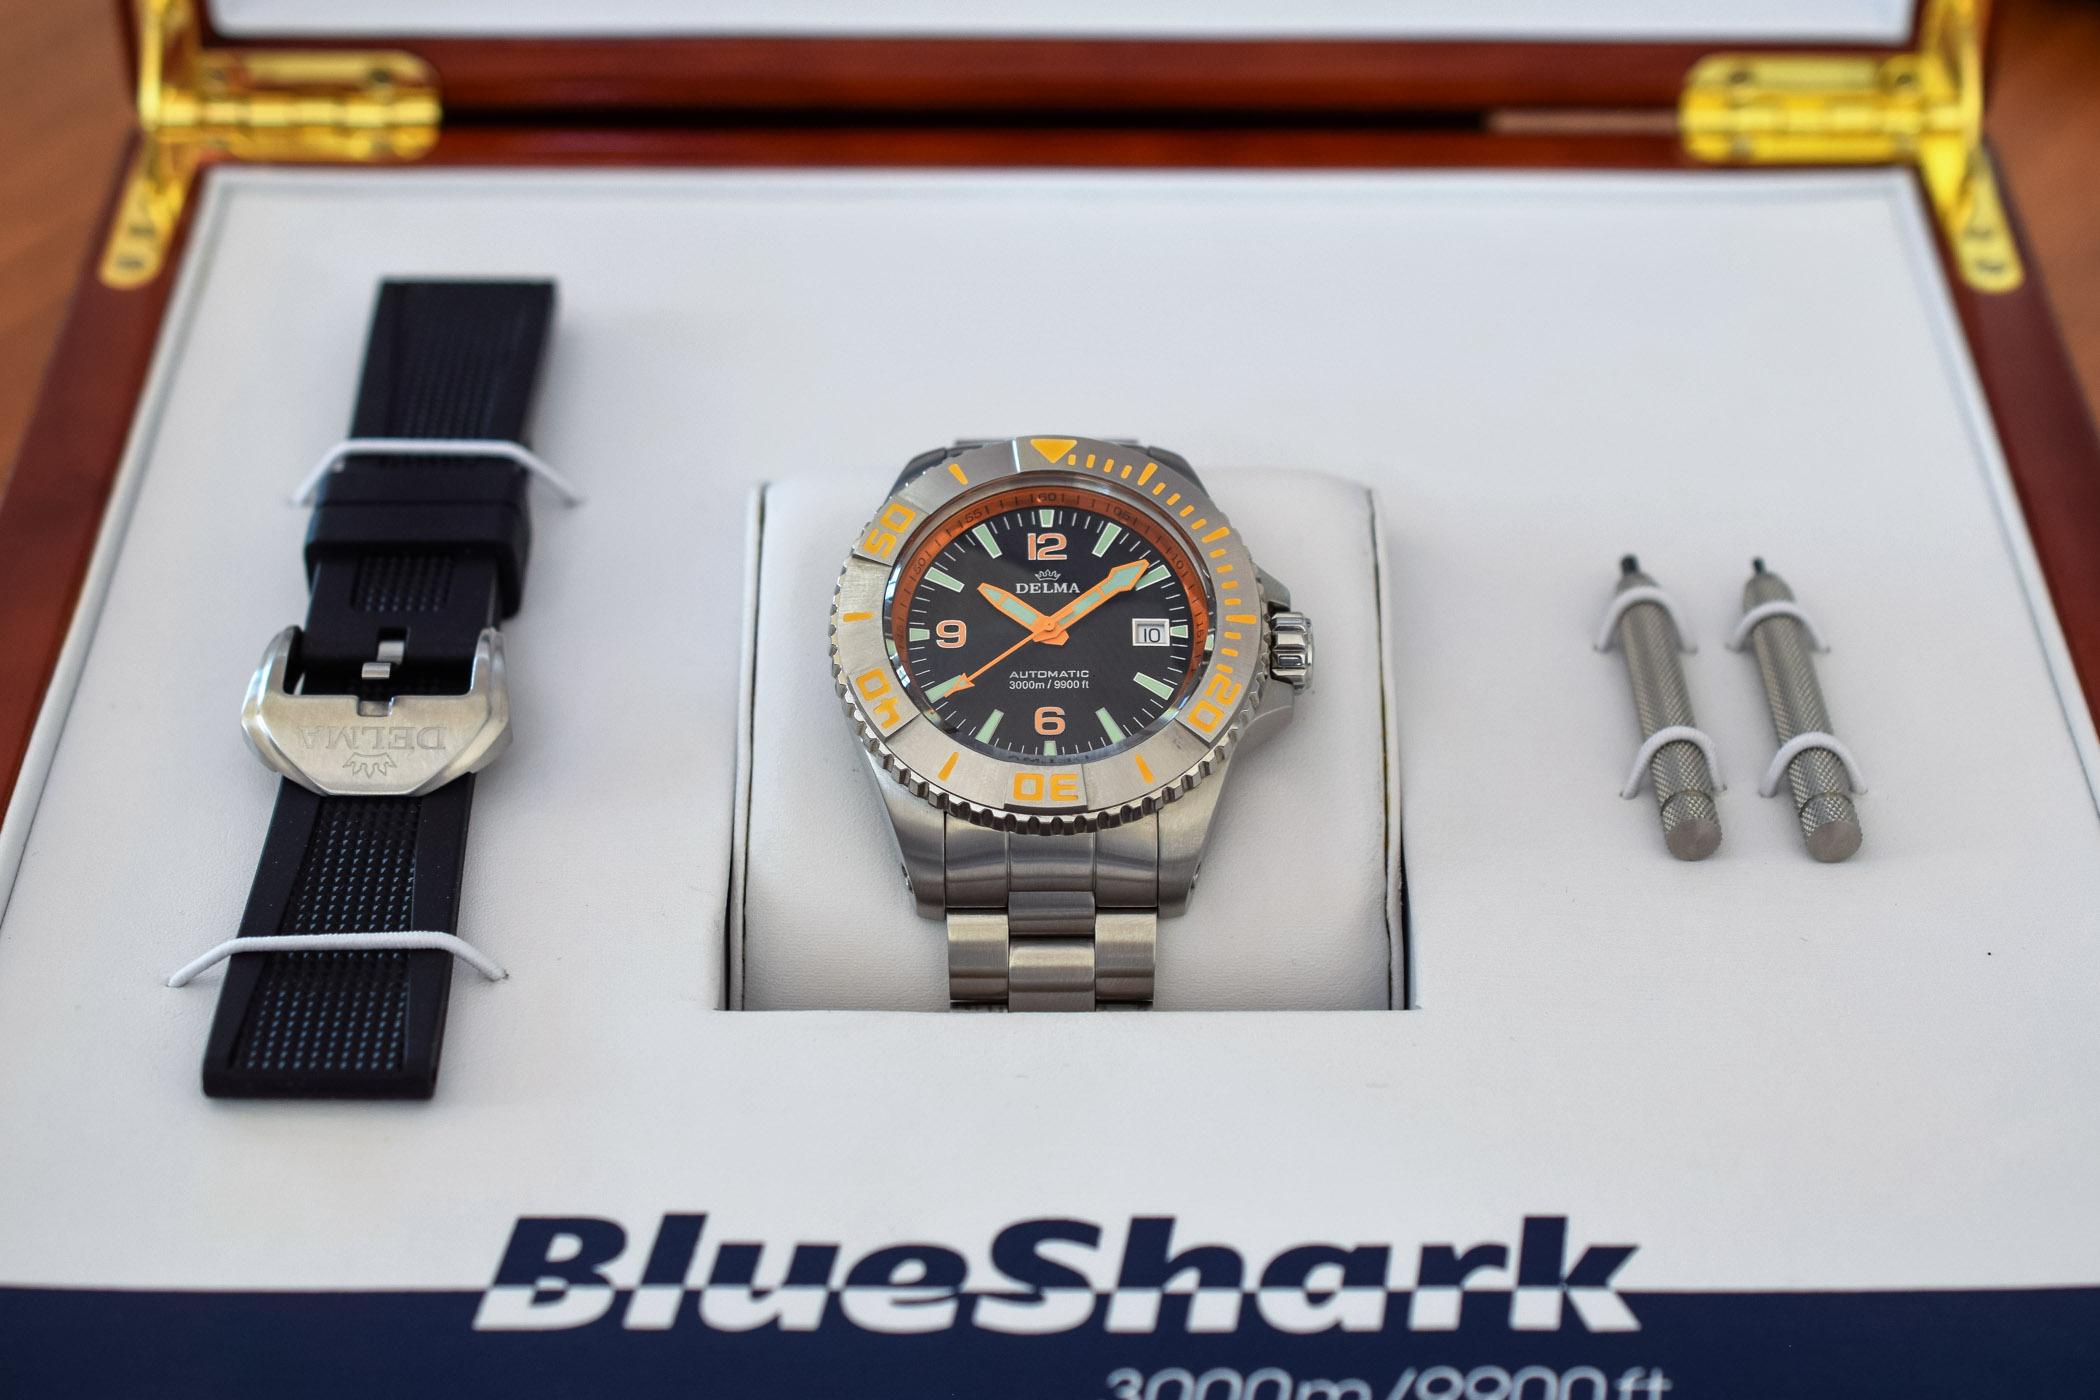 Delma Blue Shark II 3000m Dive Watch